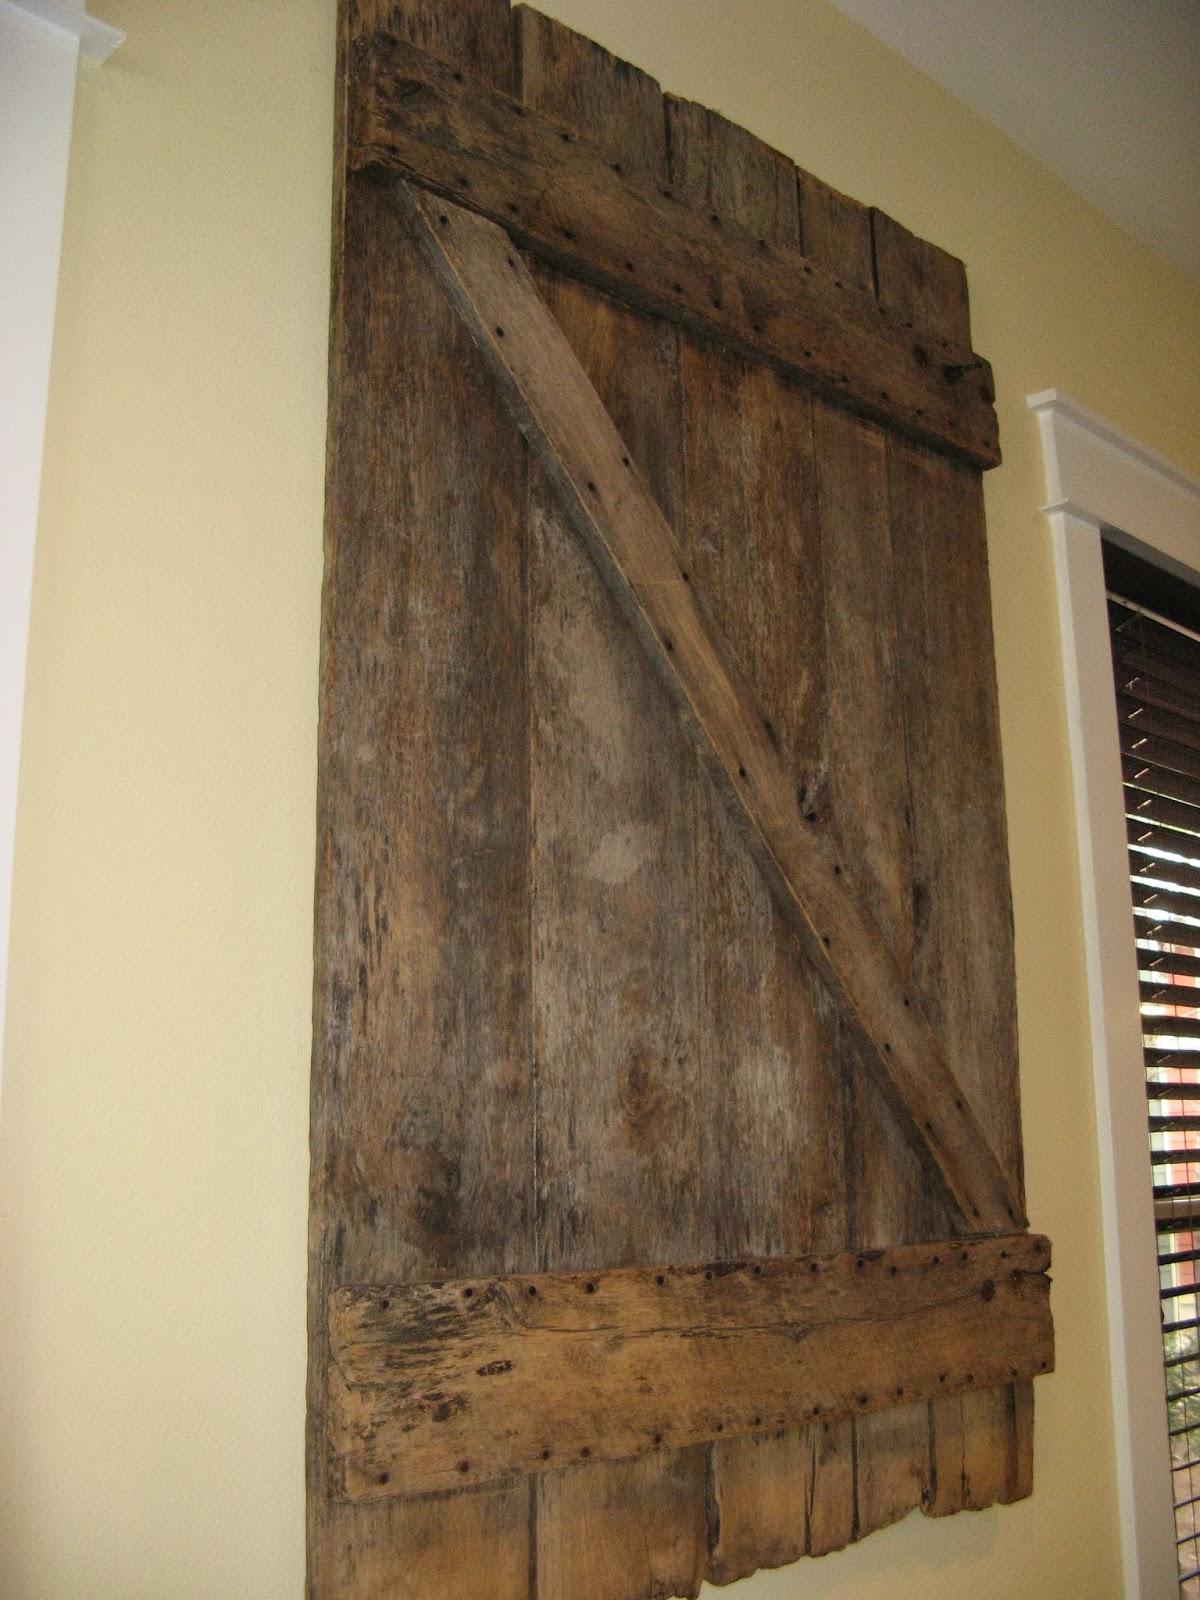 Susan Snyder: BARN DOOR WALL ART